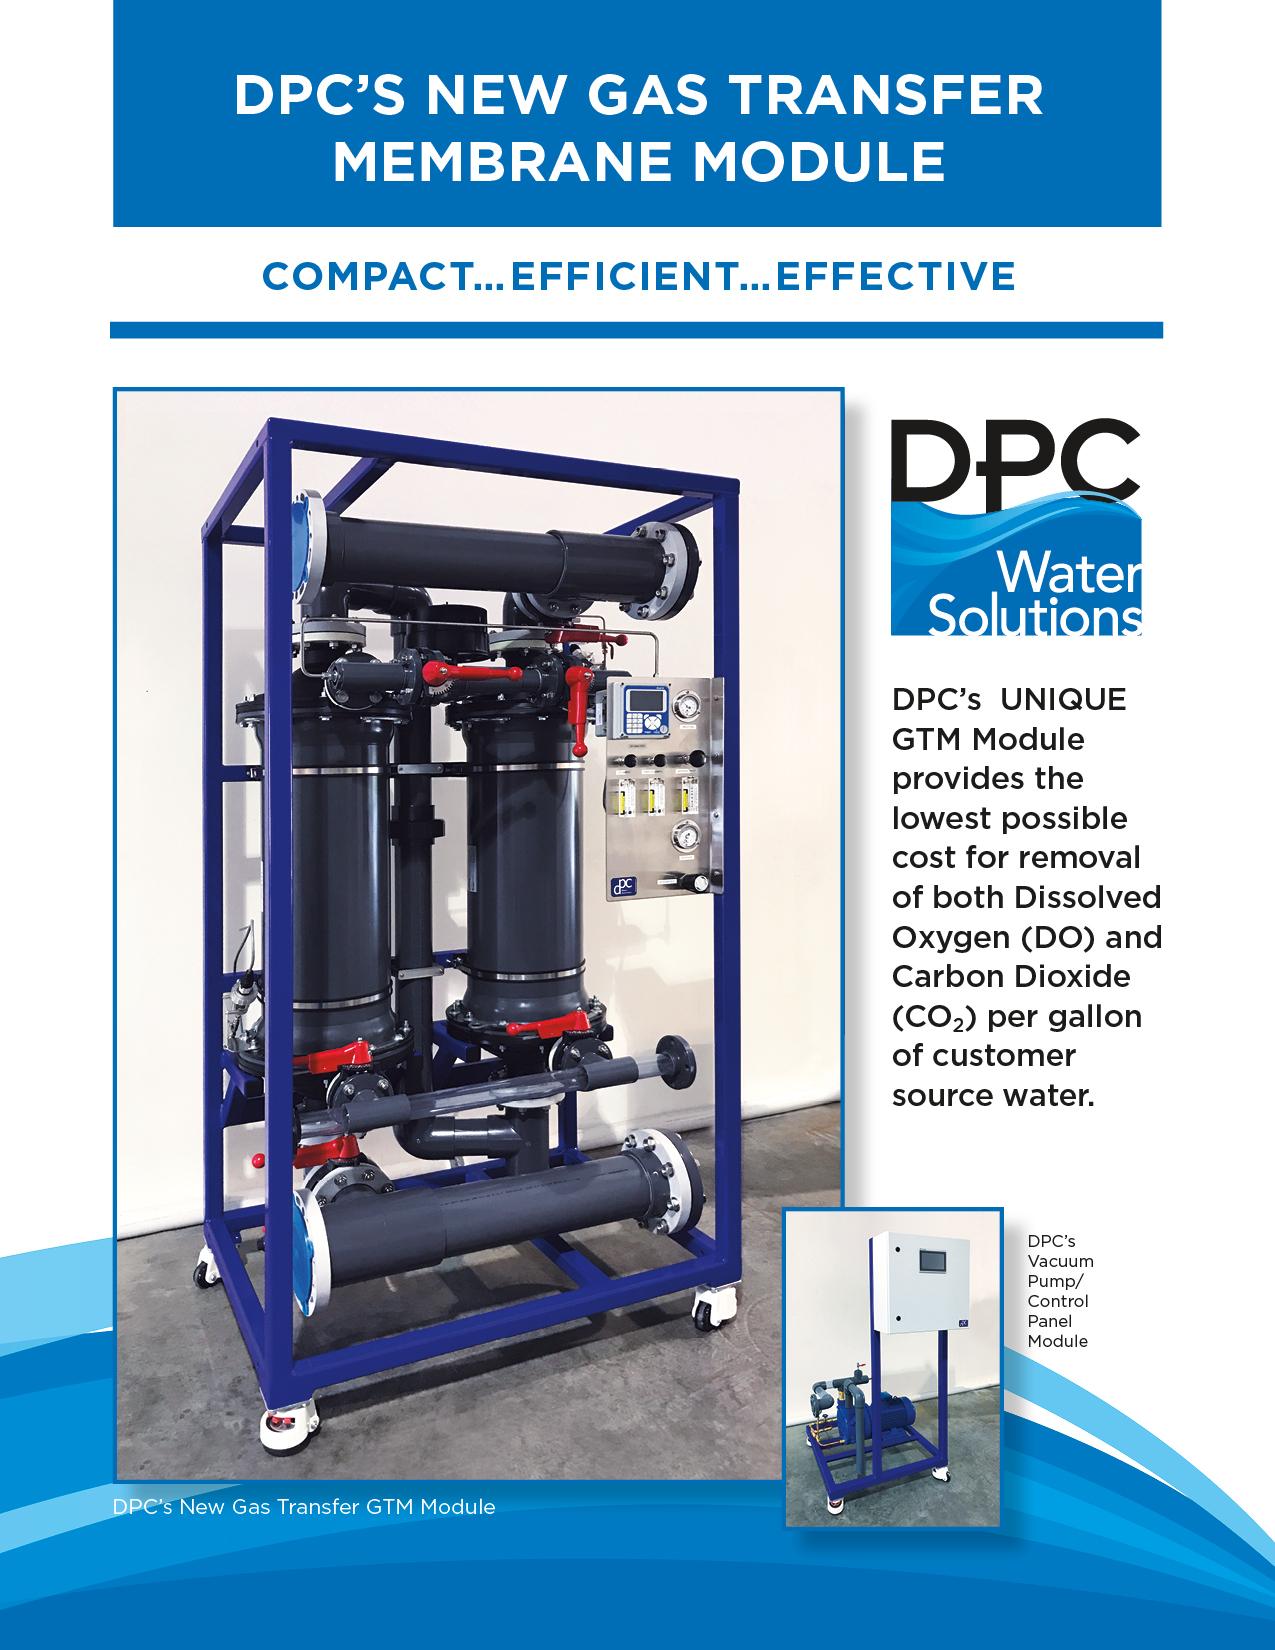 DPC's New Gas Transfer GTM Module -